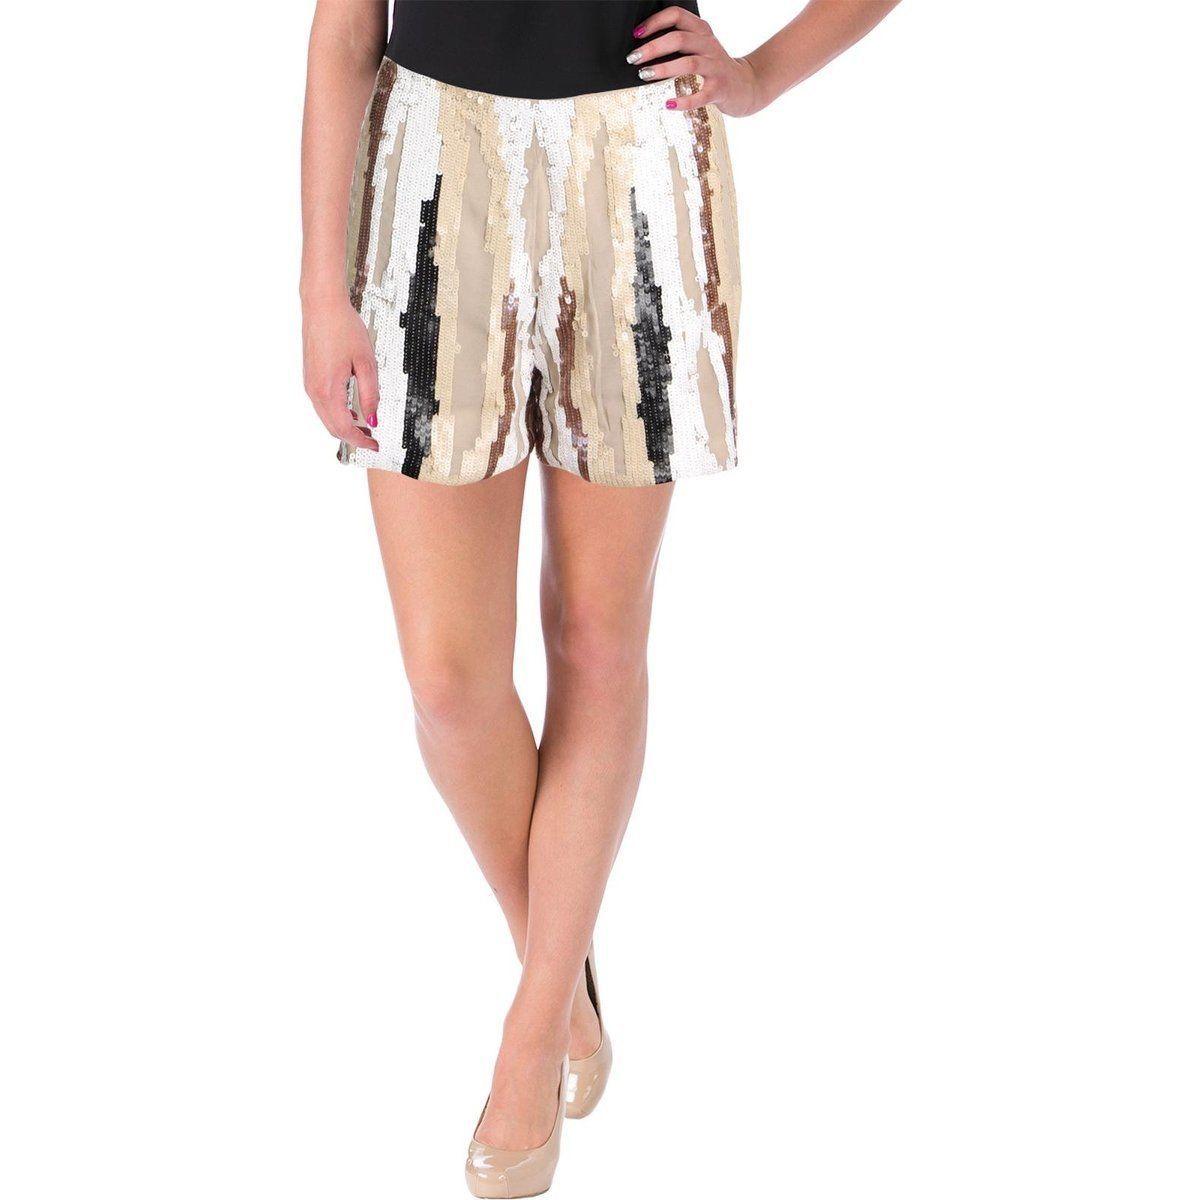 Guess Women's Lola Chiffon Sequined Dress Shorts Size 4